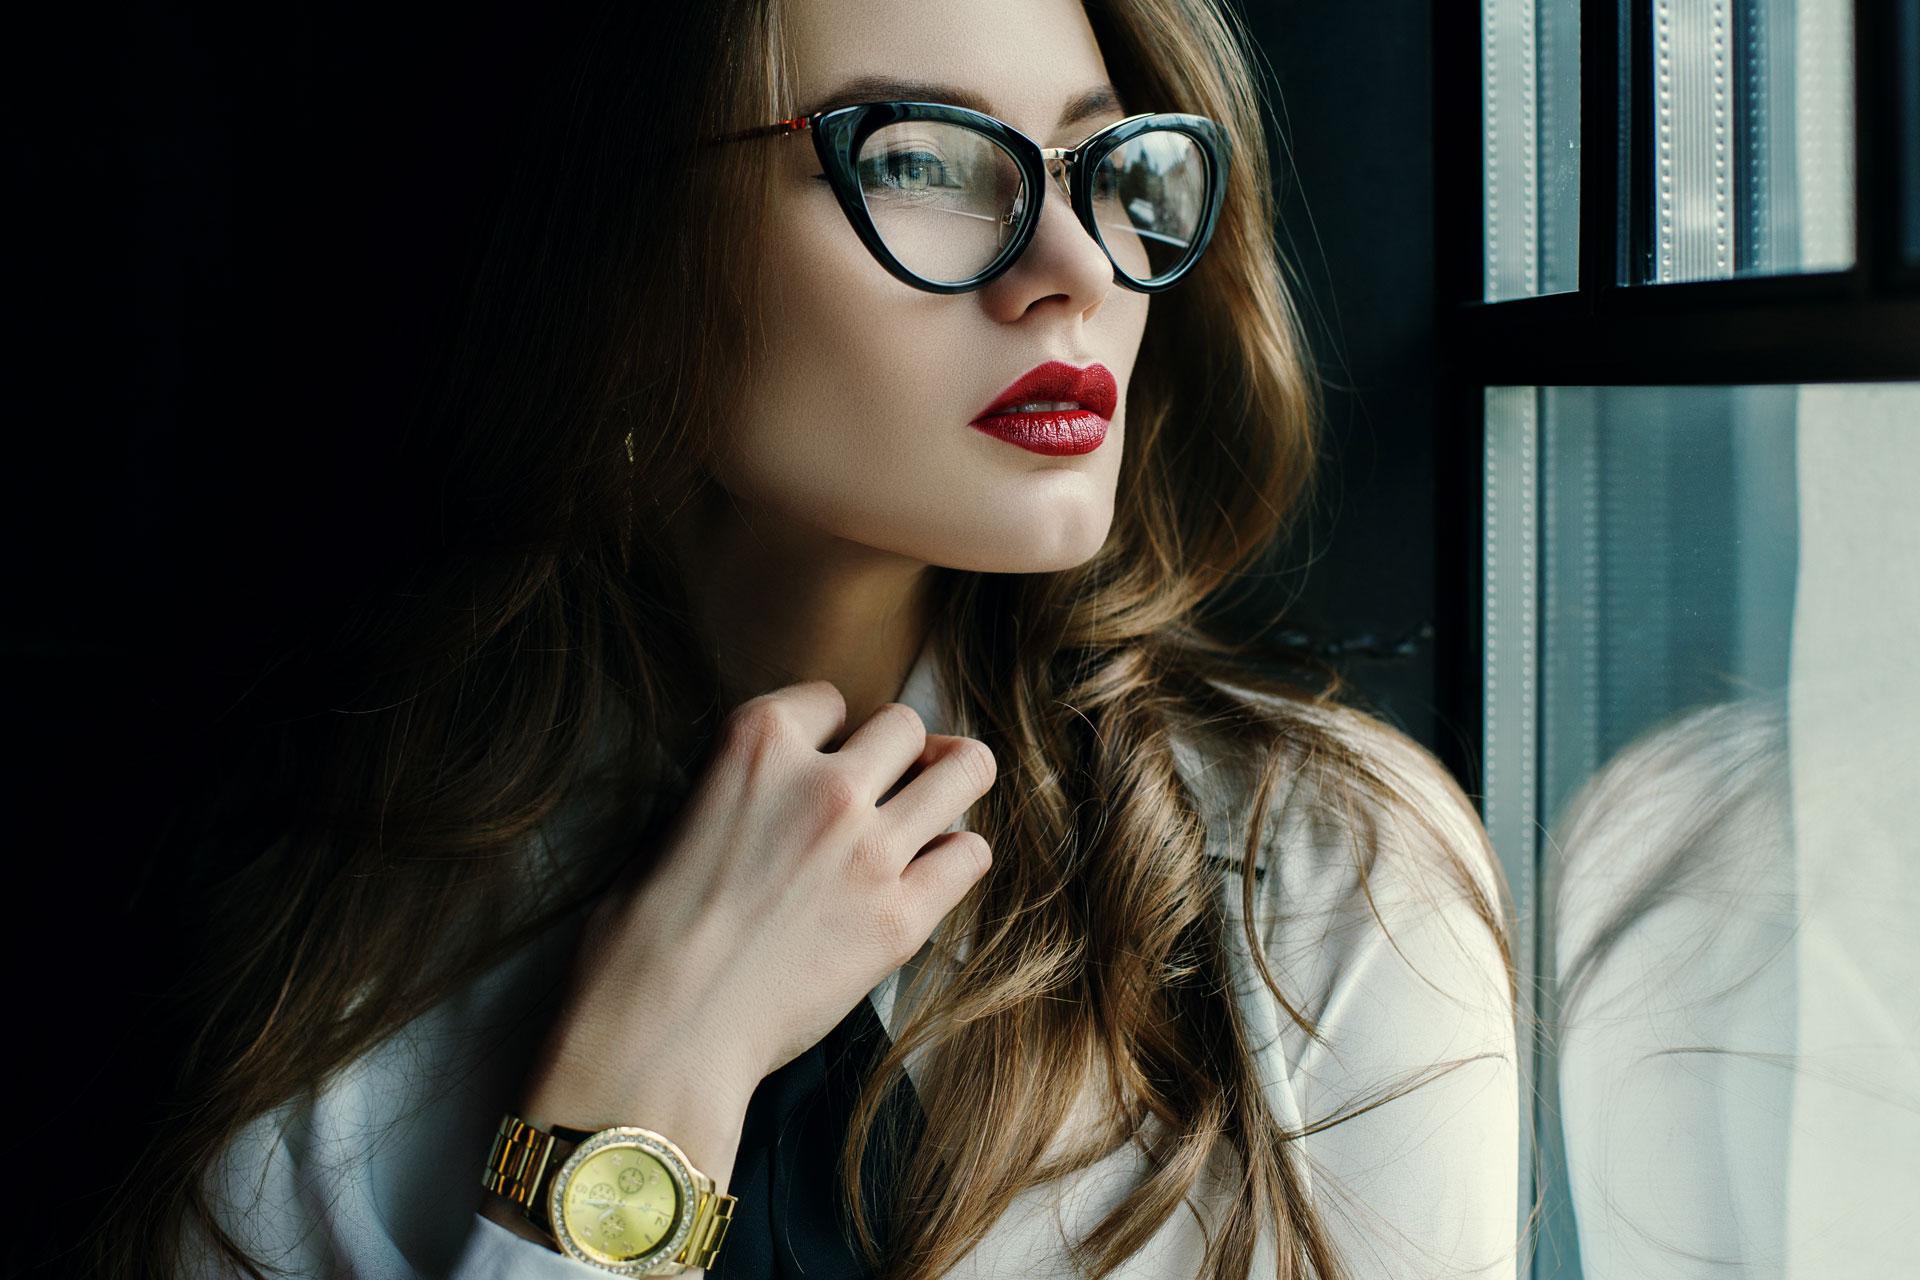 Kvinners mote metall hjerteformede farge speil solbriller